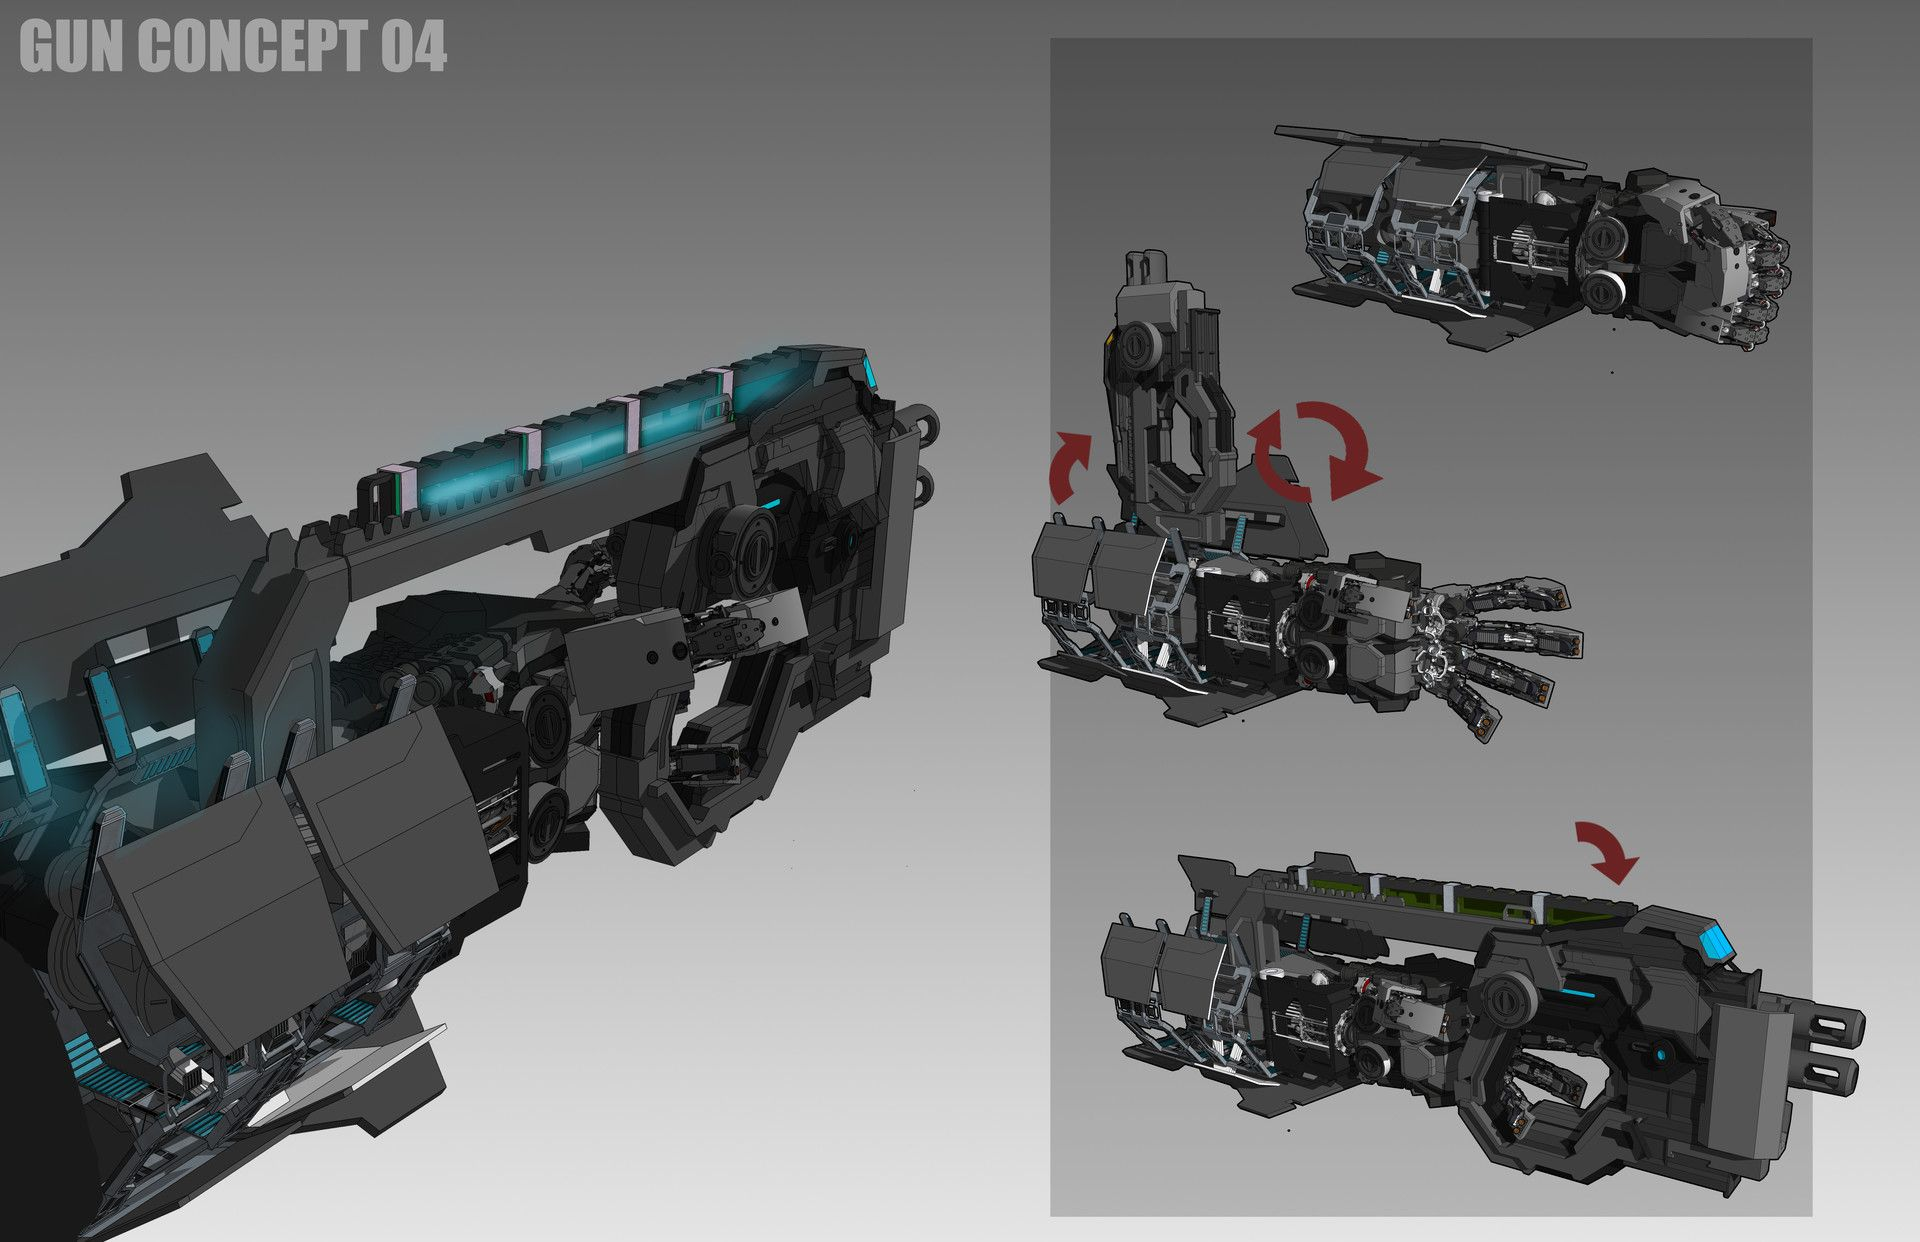 ArtStation - Archangel mech arm, bryant Koshu | Weapons For Comic in